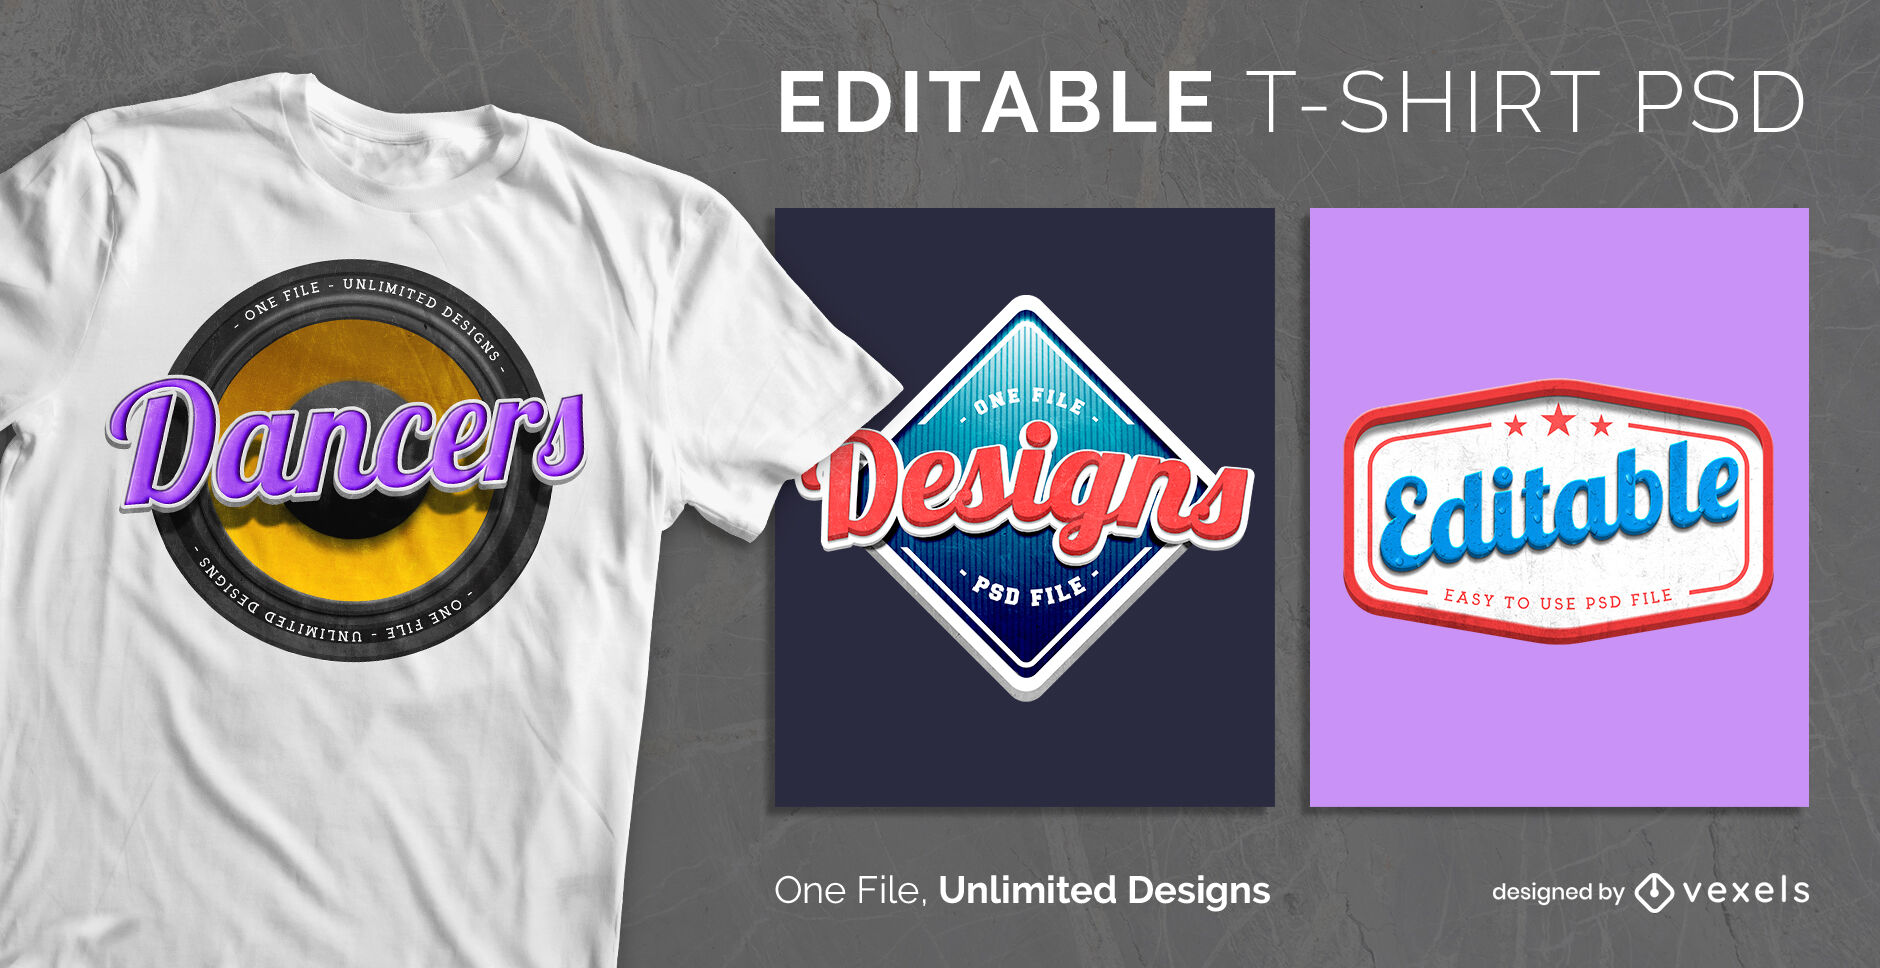 Retro badges logo scalable t-shirt psd